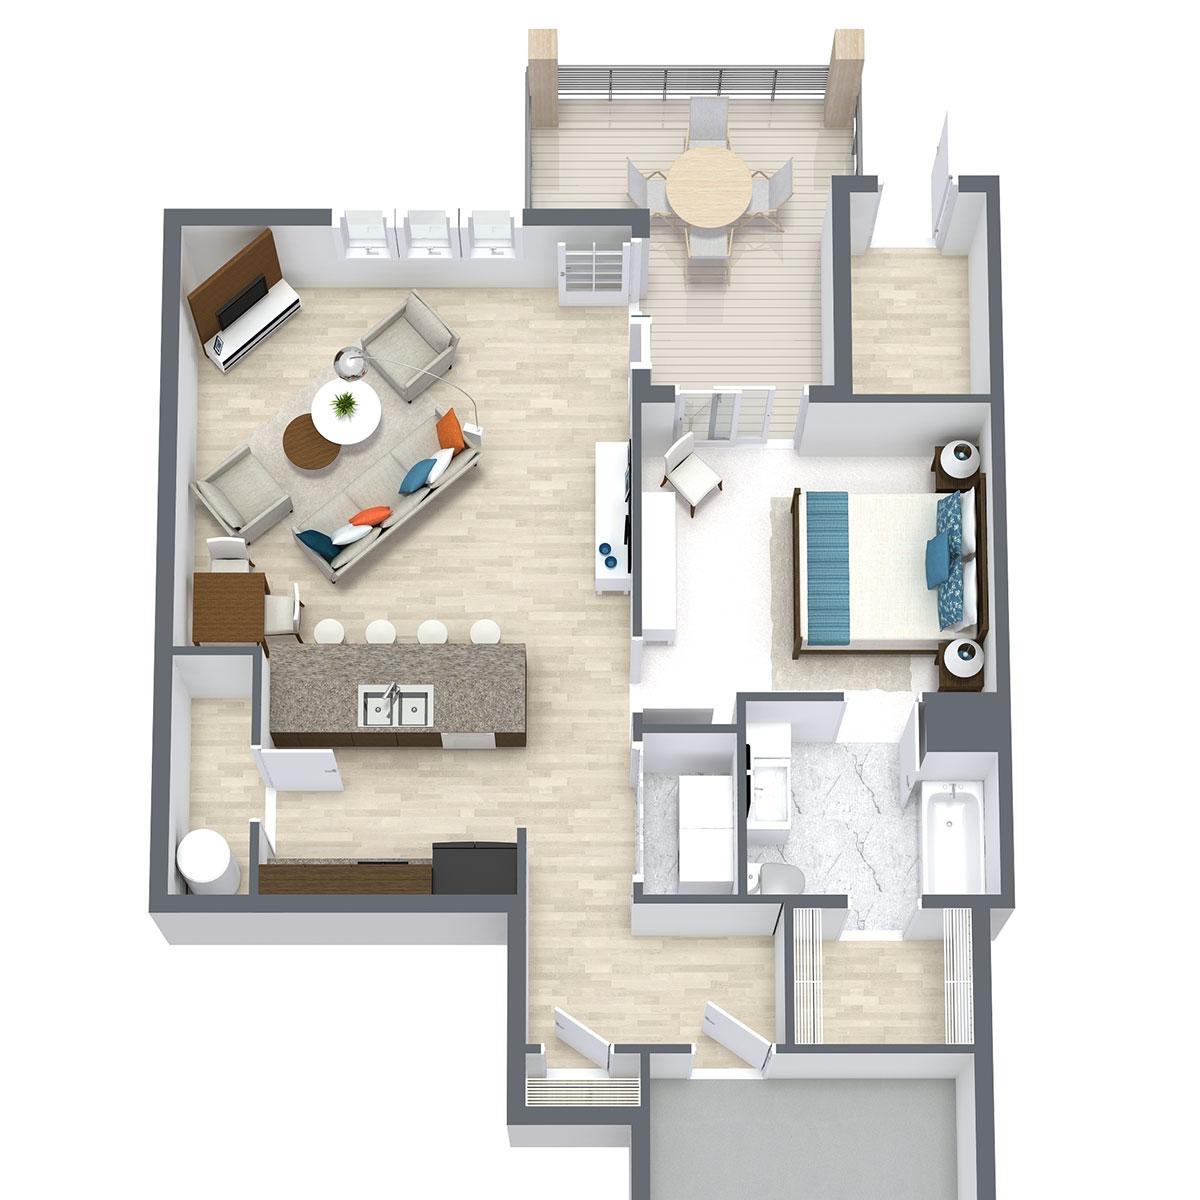 Ravello 192 - Floorplan - One Bed One Bath 787